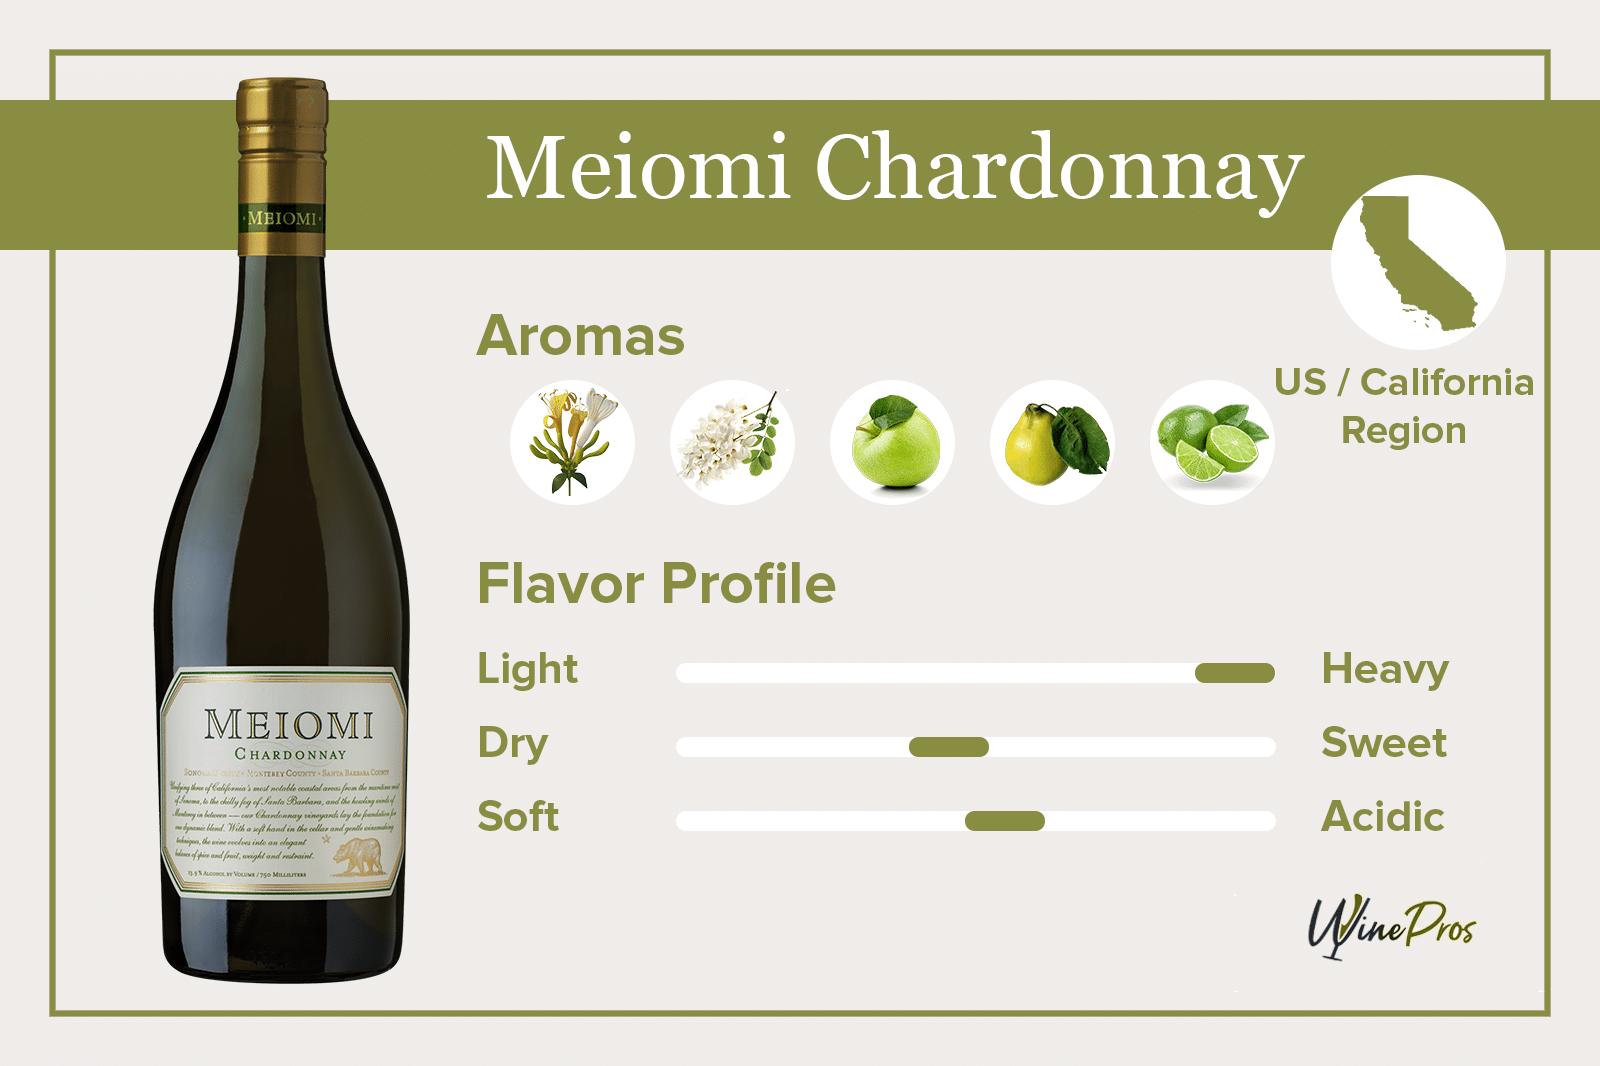 Meiomi Chardonnay Featured